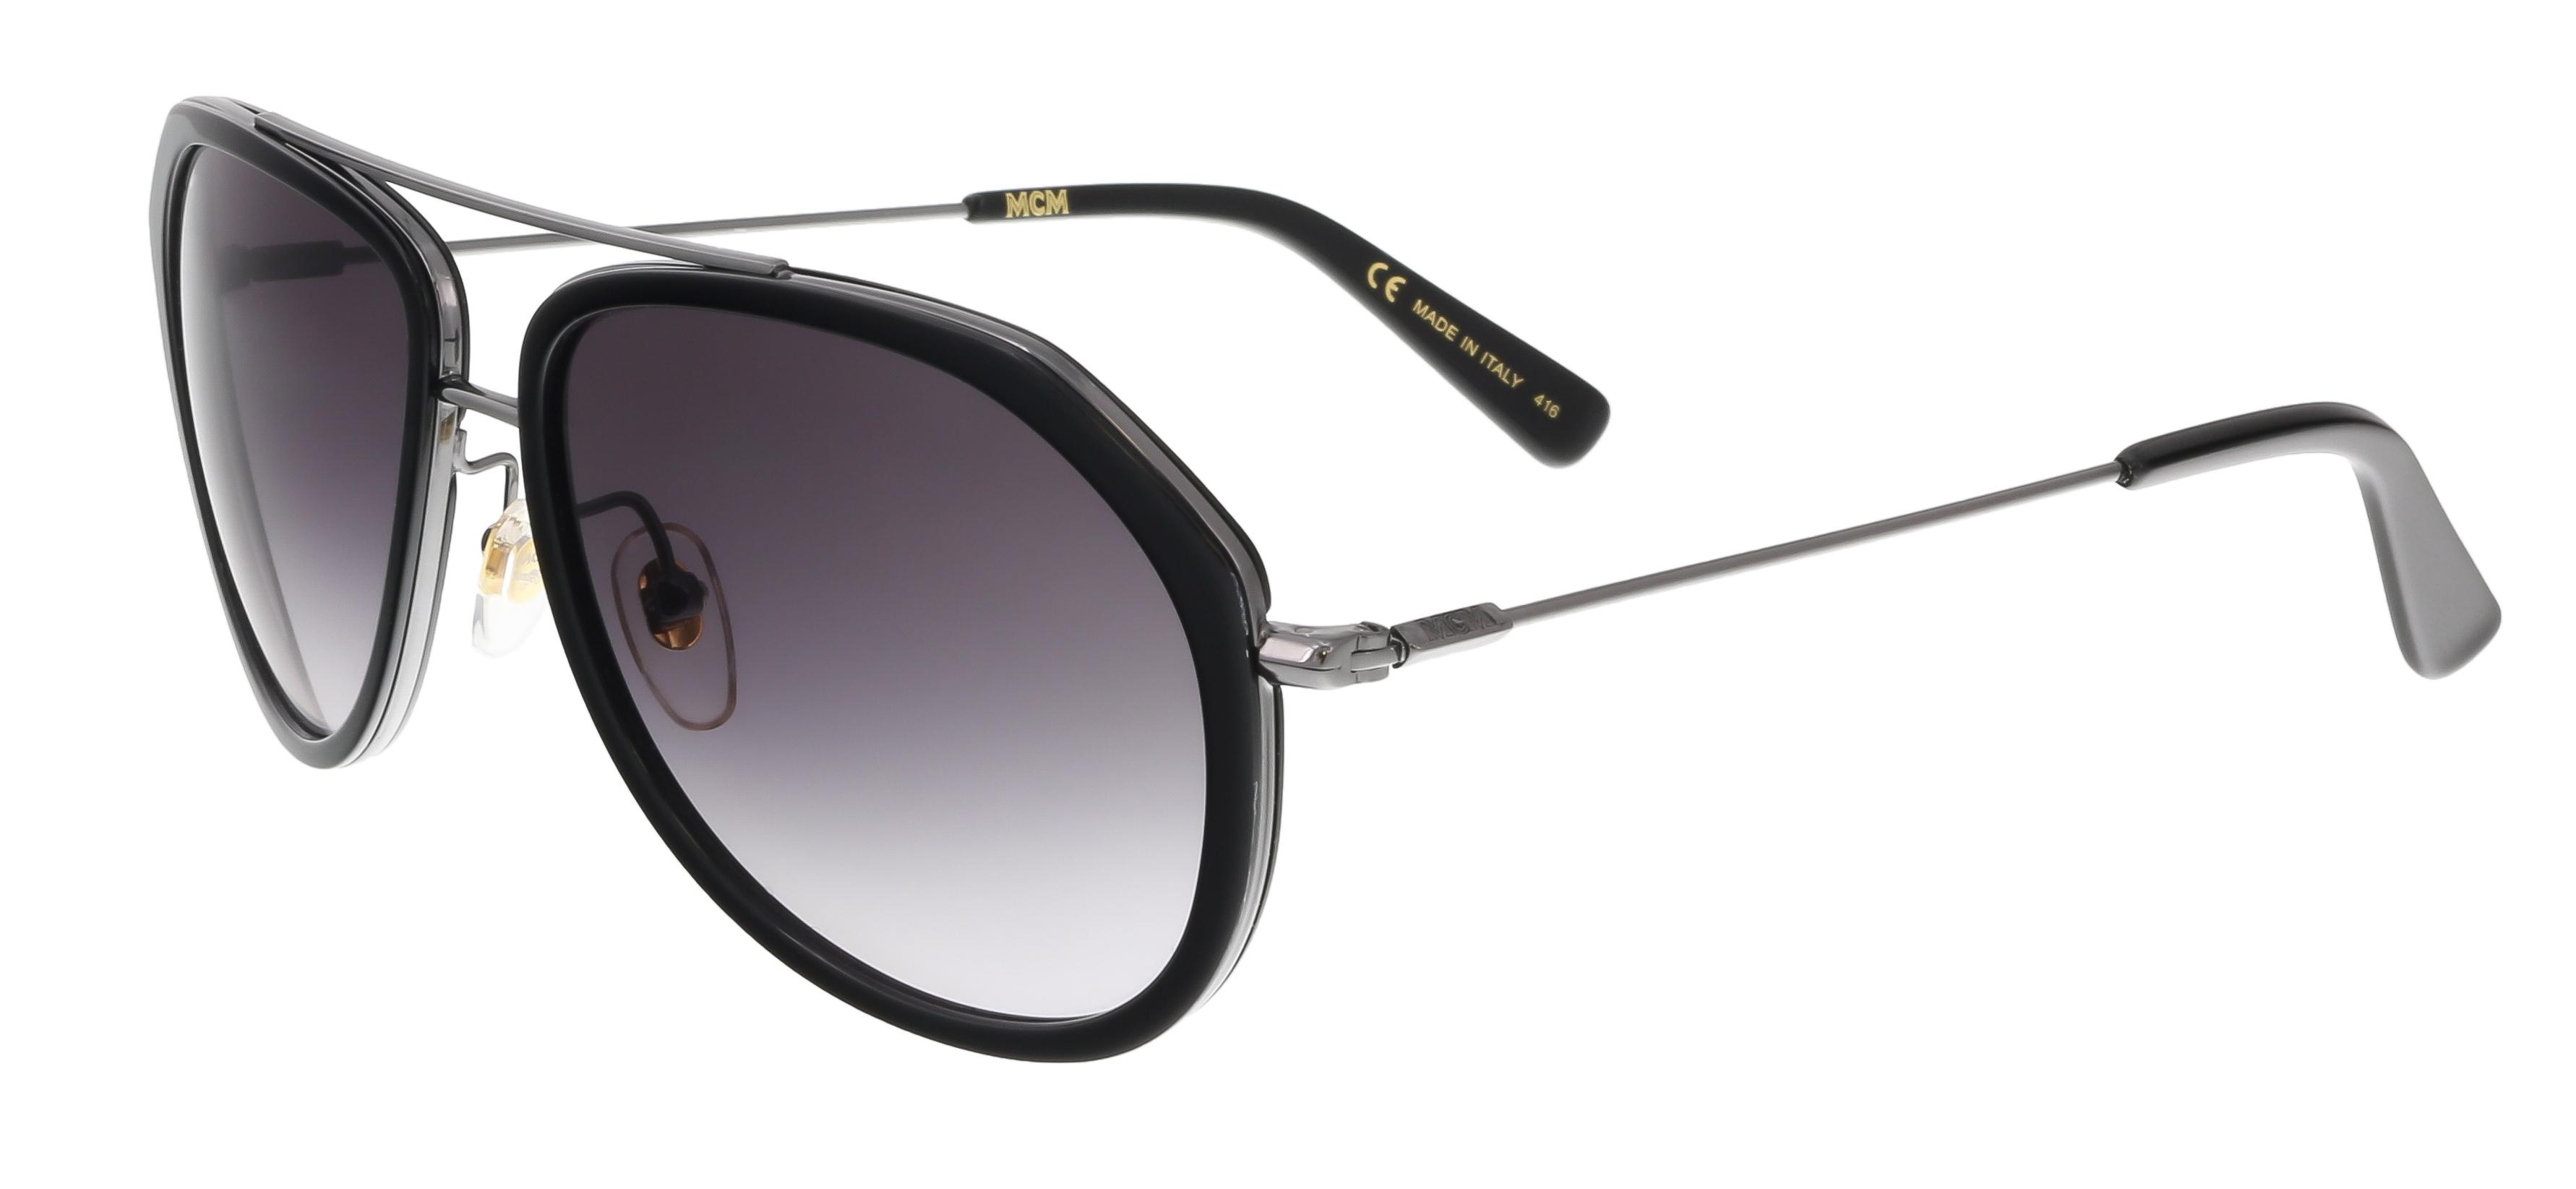 MCM613S 001 Black Aviator Feline Sunglasses